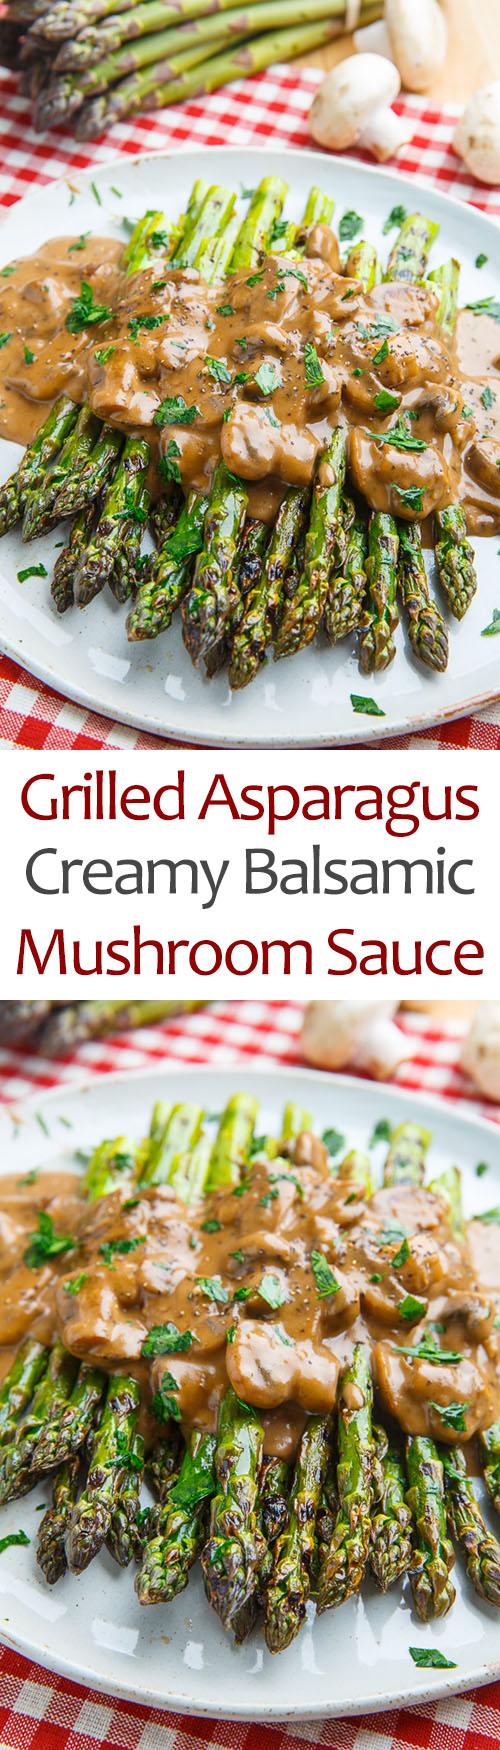 Grilled Asparagus in a Creamy Balsamic Mushroom Sauce